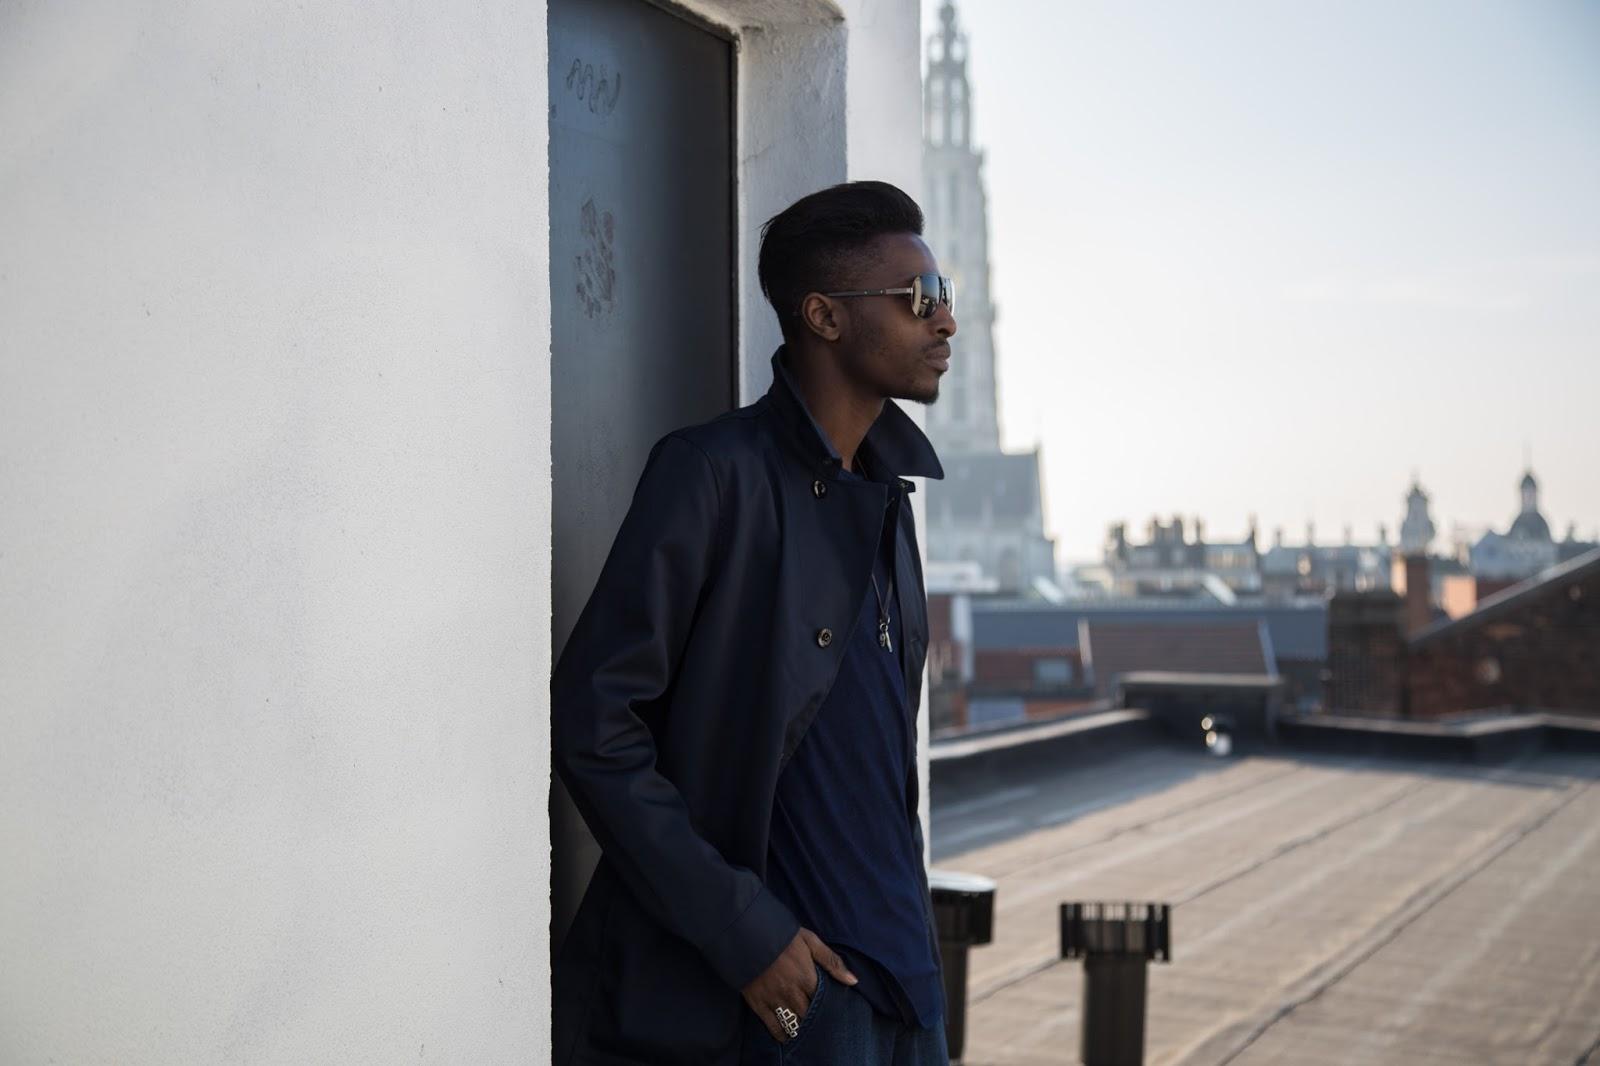 JONTHEGOLD rooftop blue g-star raw coat  salvatore ferragamo sunglasses bohemian vixen accessories